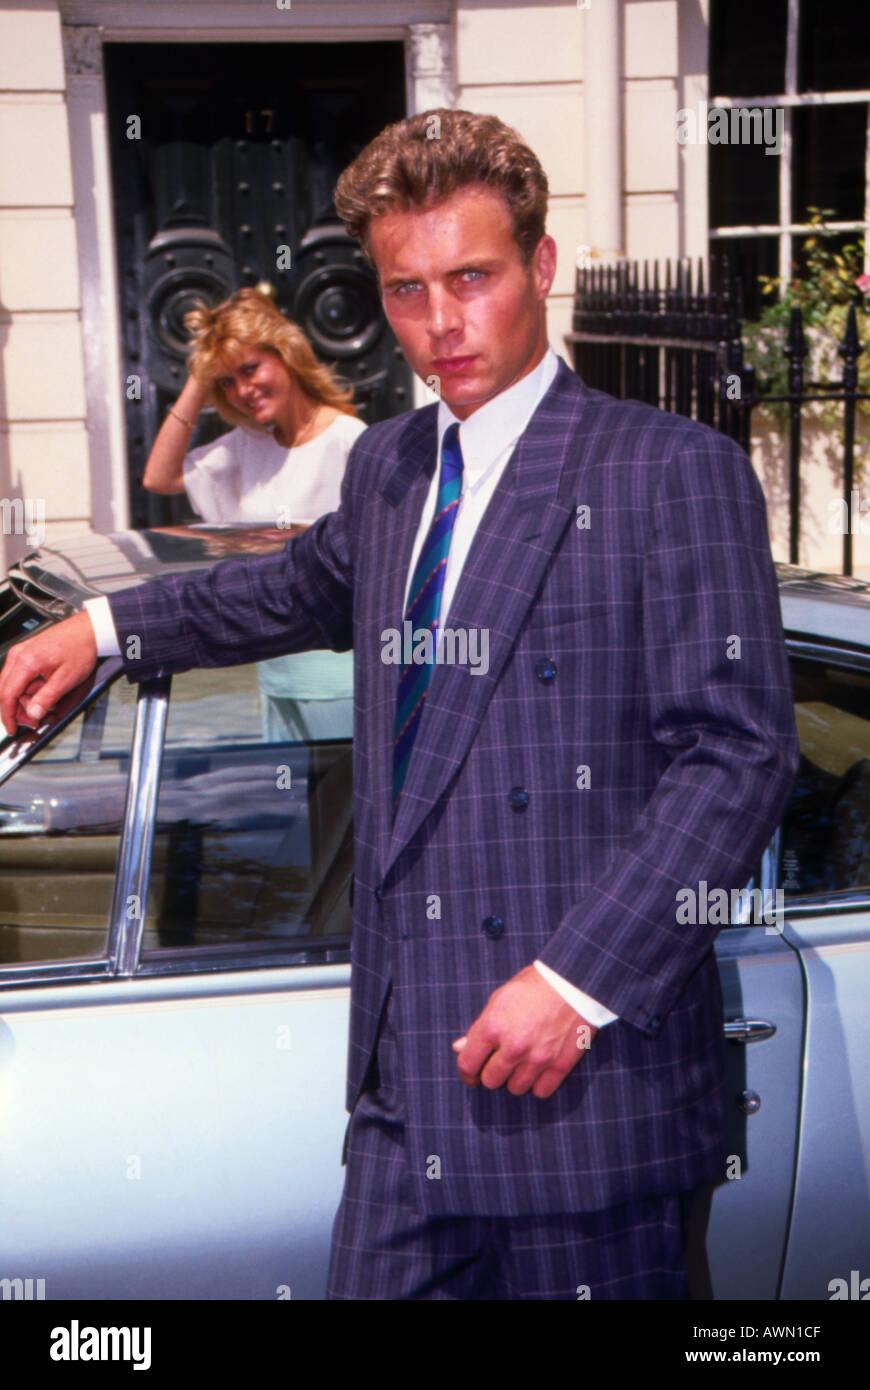 Male fashion model 1970s - Stock Image